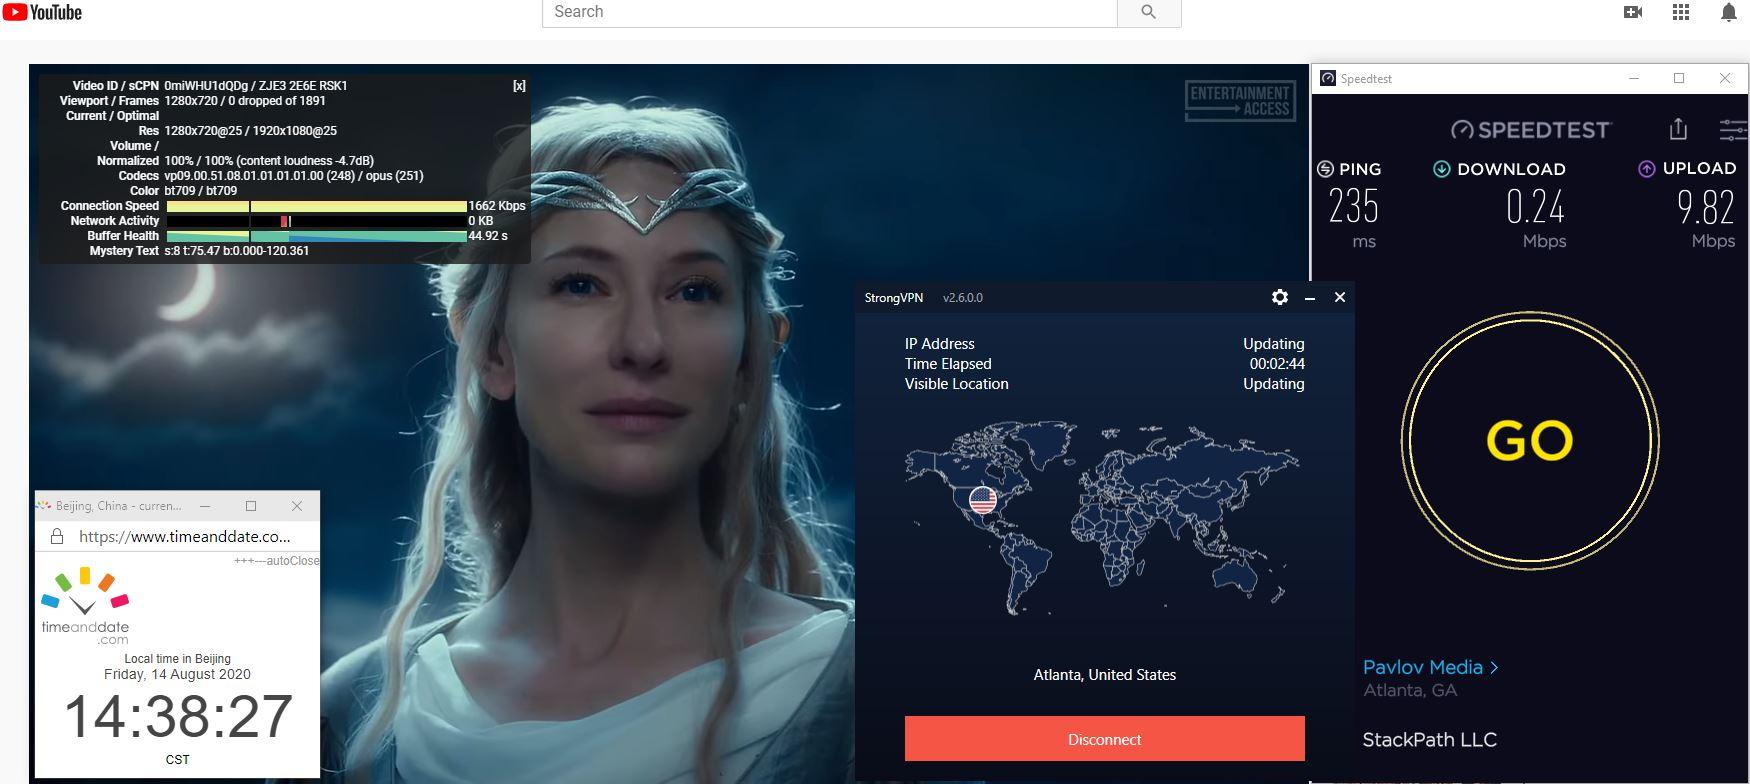 Windows10 StrongVPN IKEv2 USA - Atlanta 中国VPN 翻墙 科学上网 翻墙速度测试 - 20200814